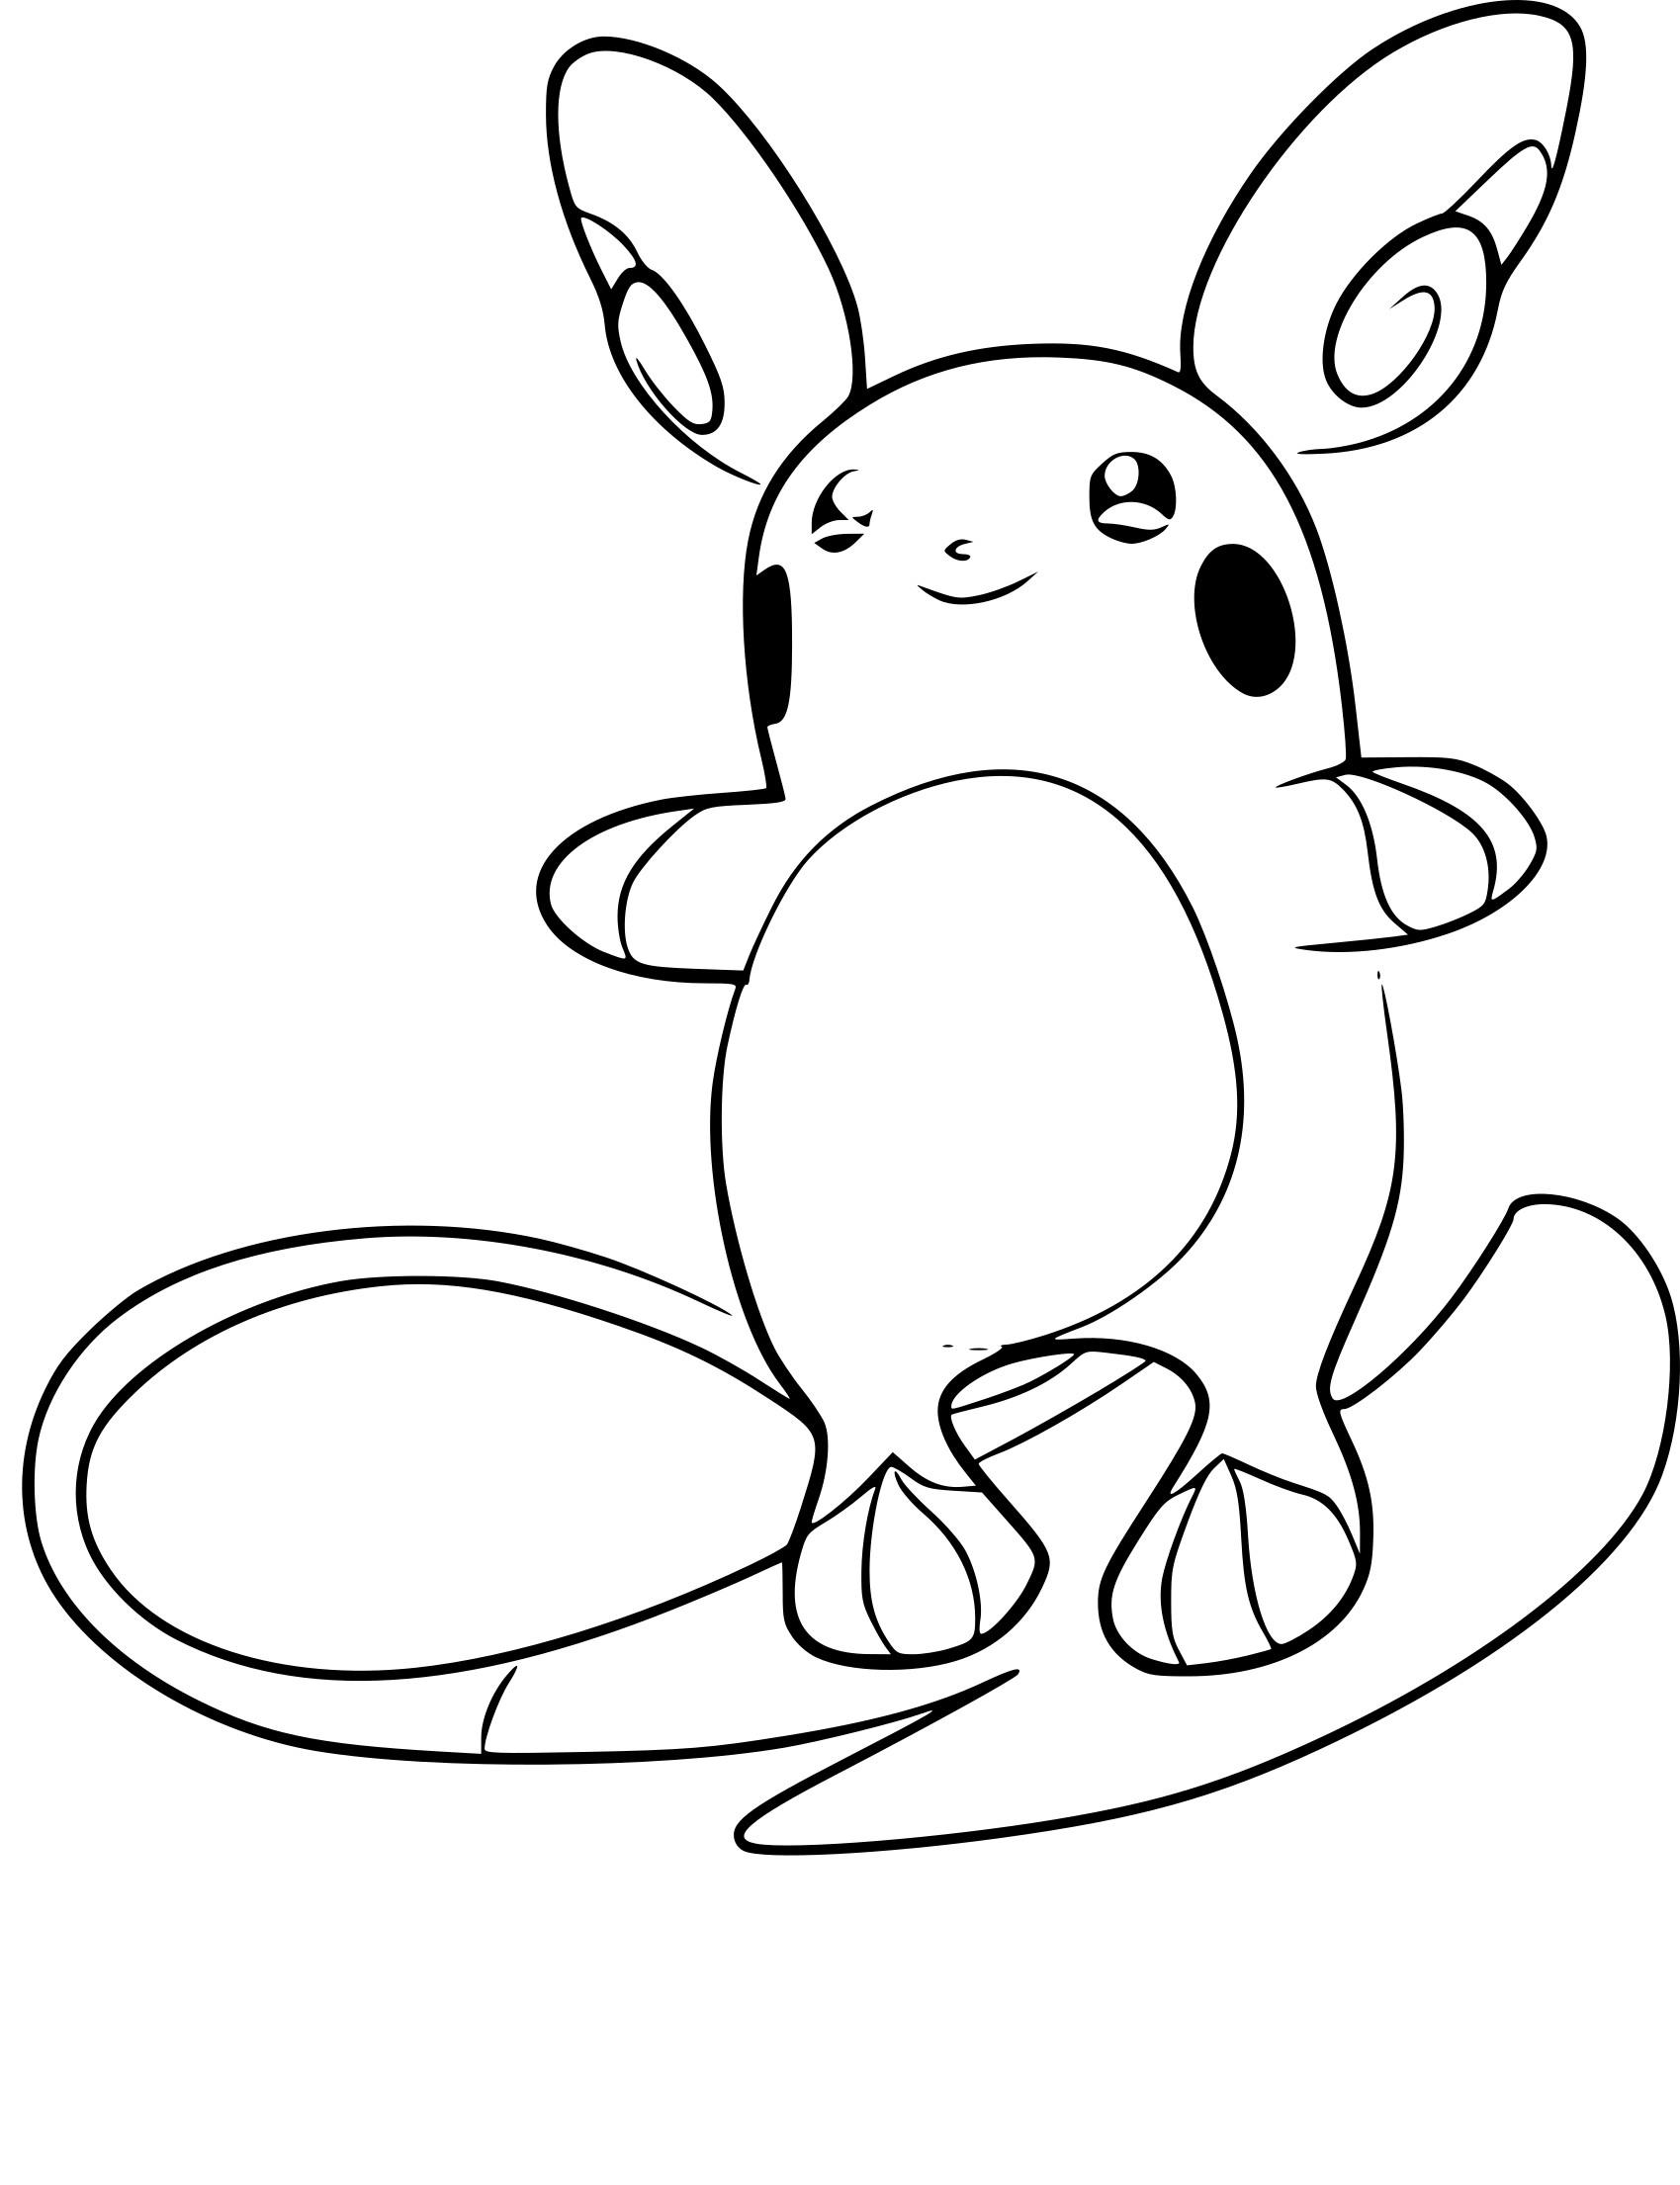 Coloriage Raichu d'Alola Pokemon à imprimer